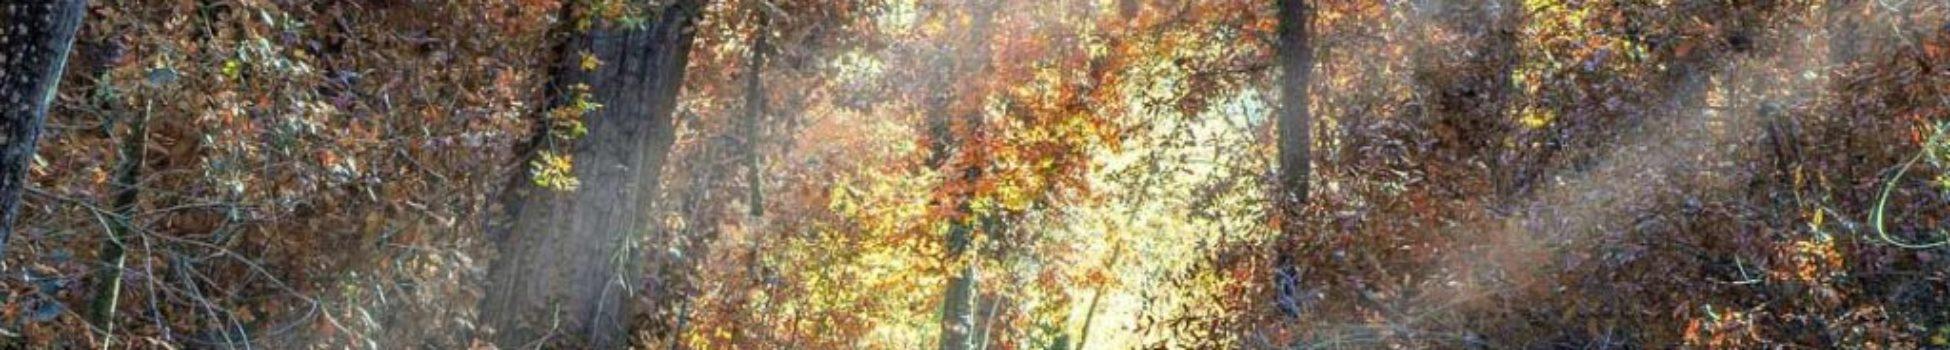 telares-octubre-miniatura